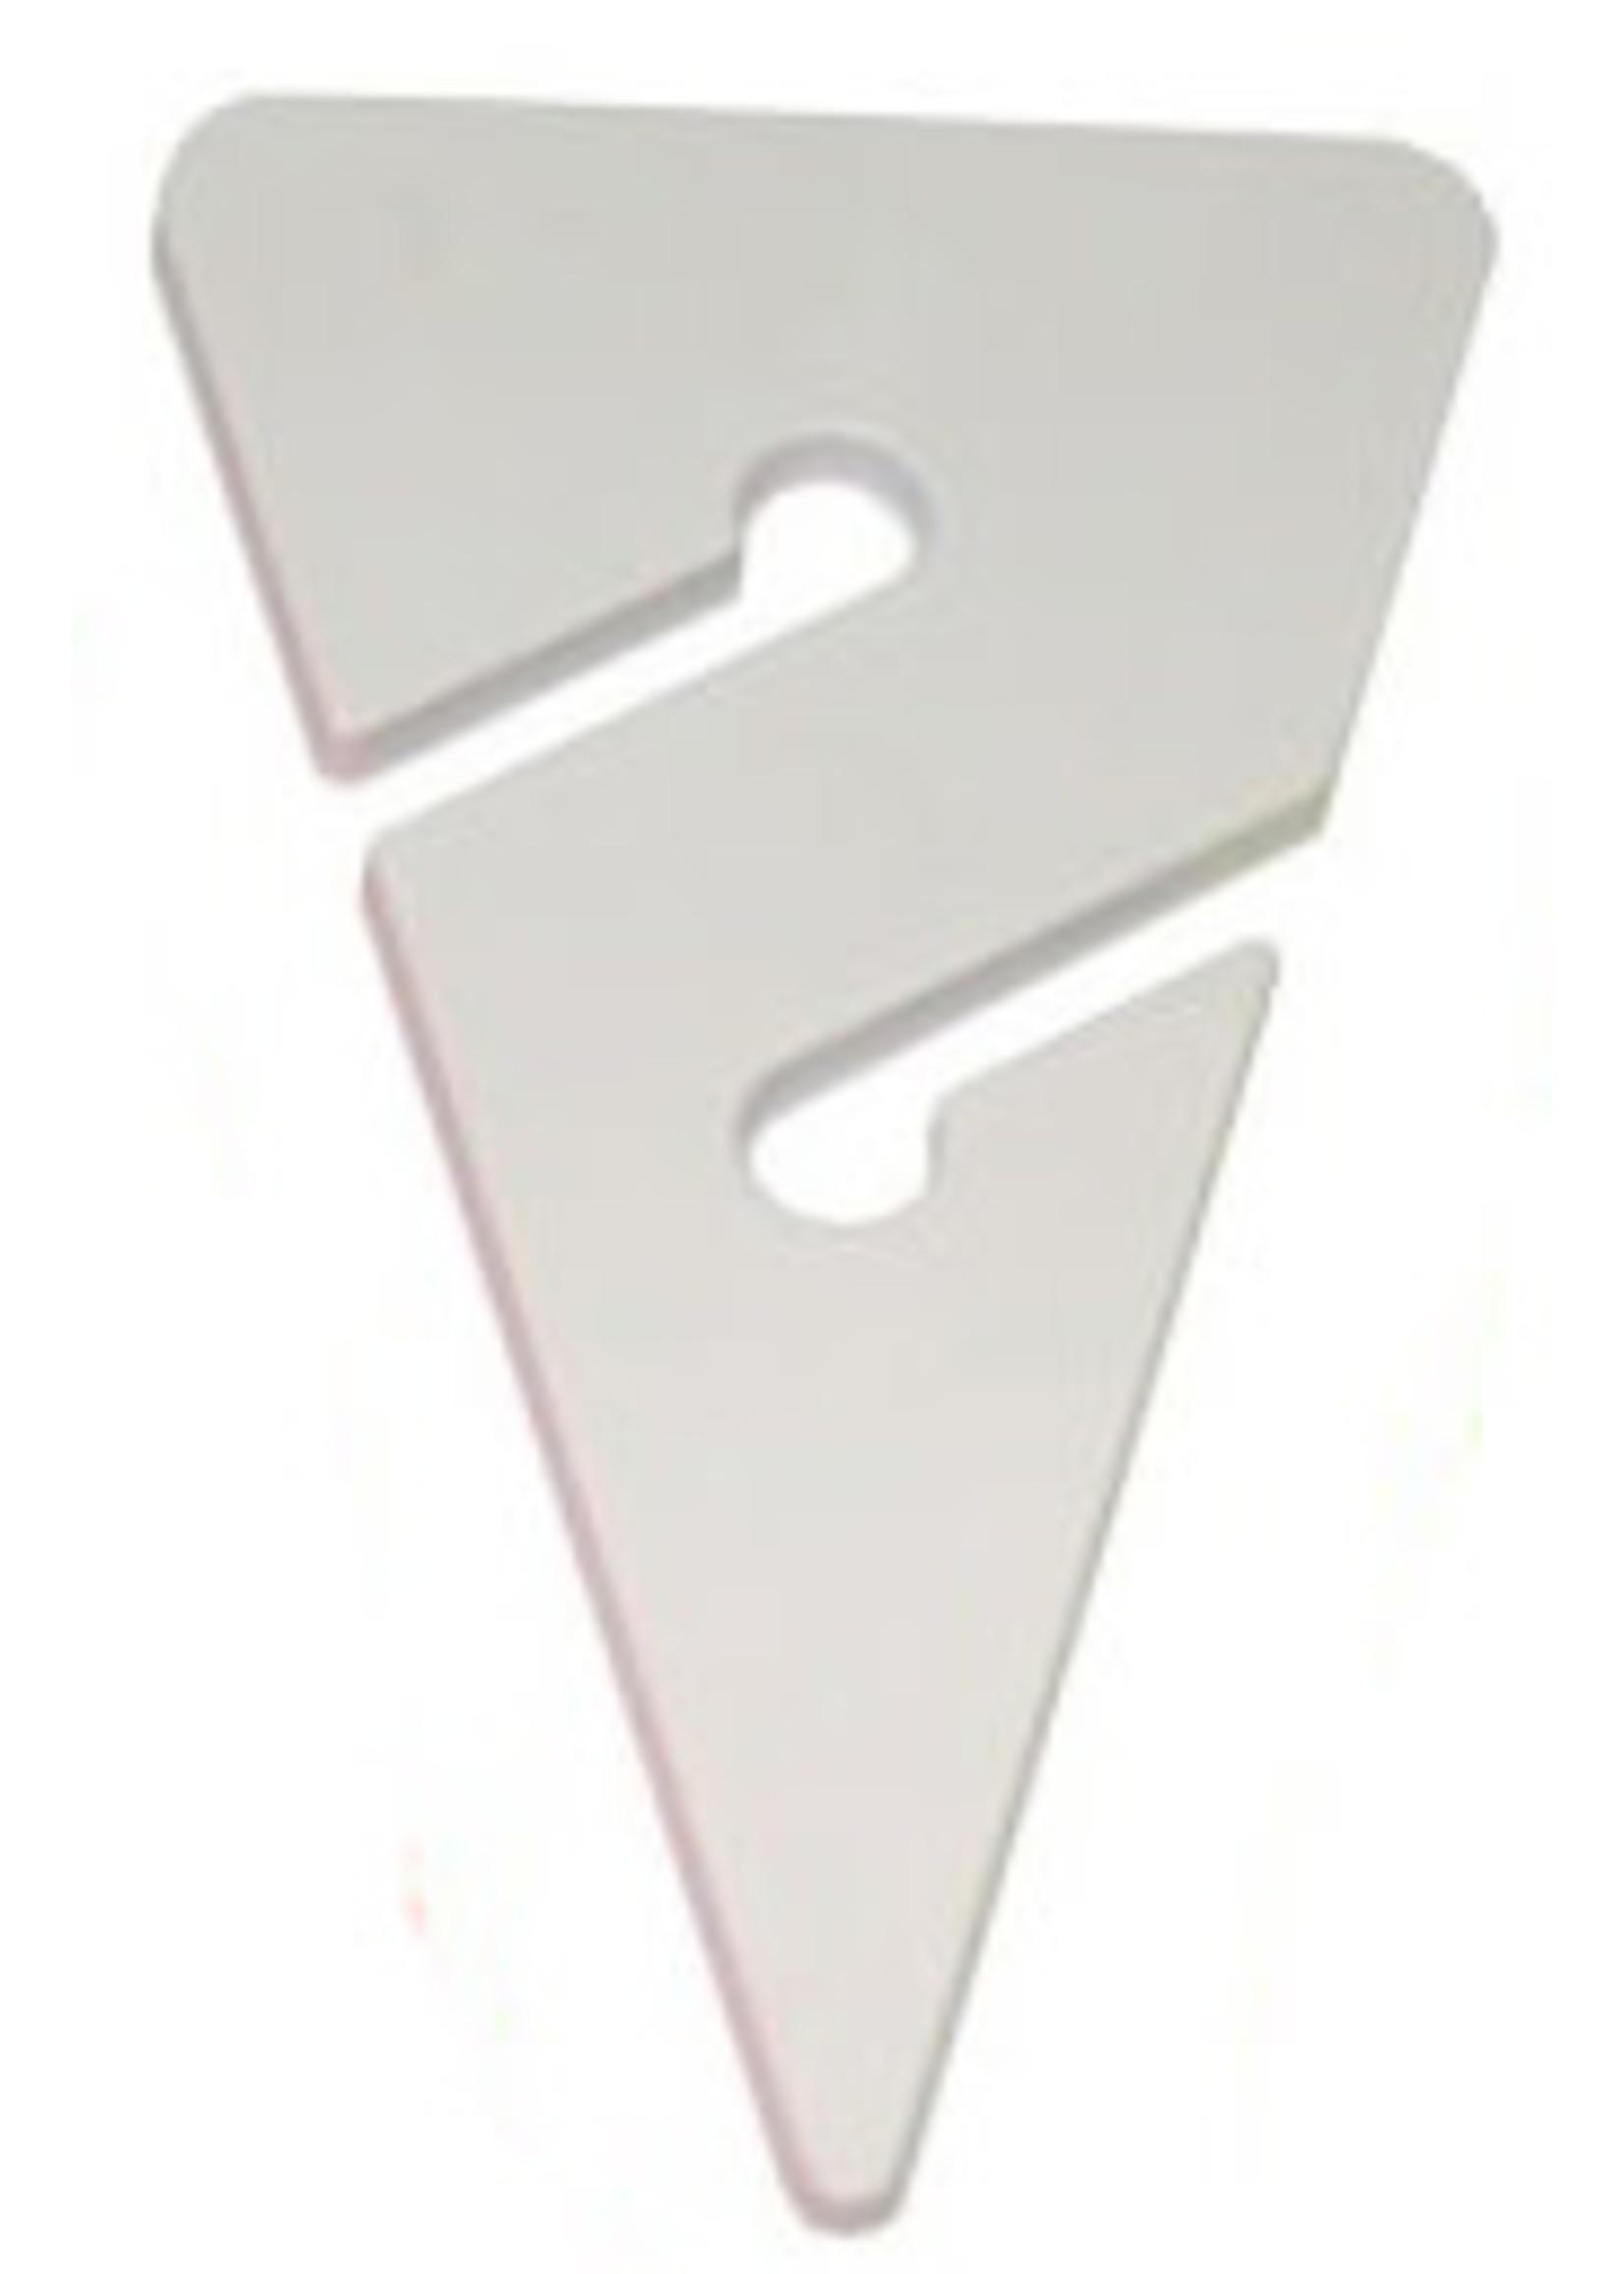 TecLine Tecline Line Markers